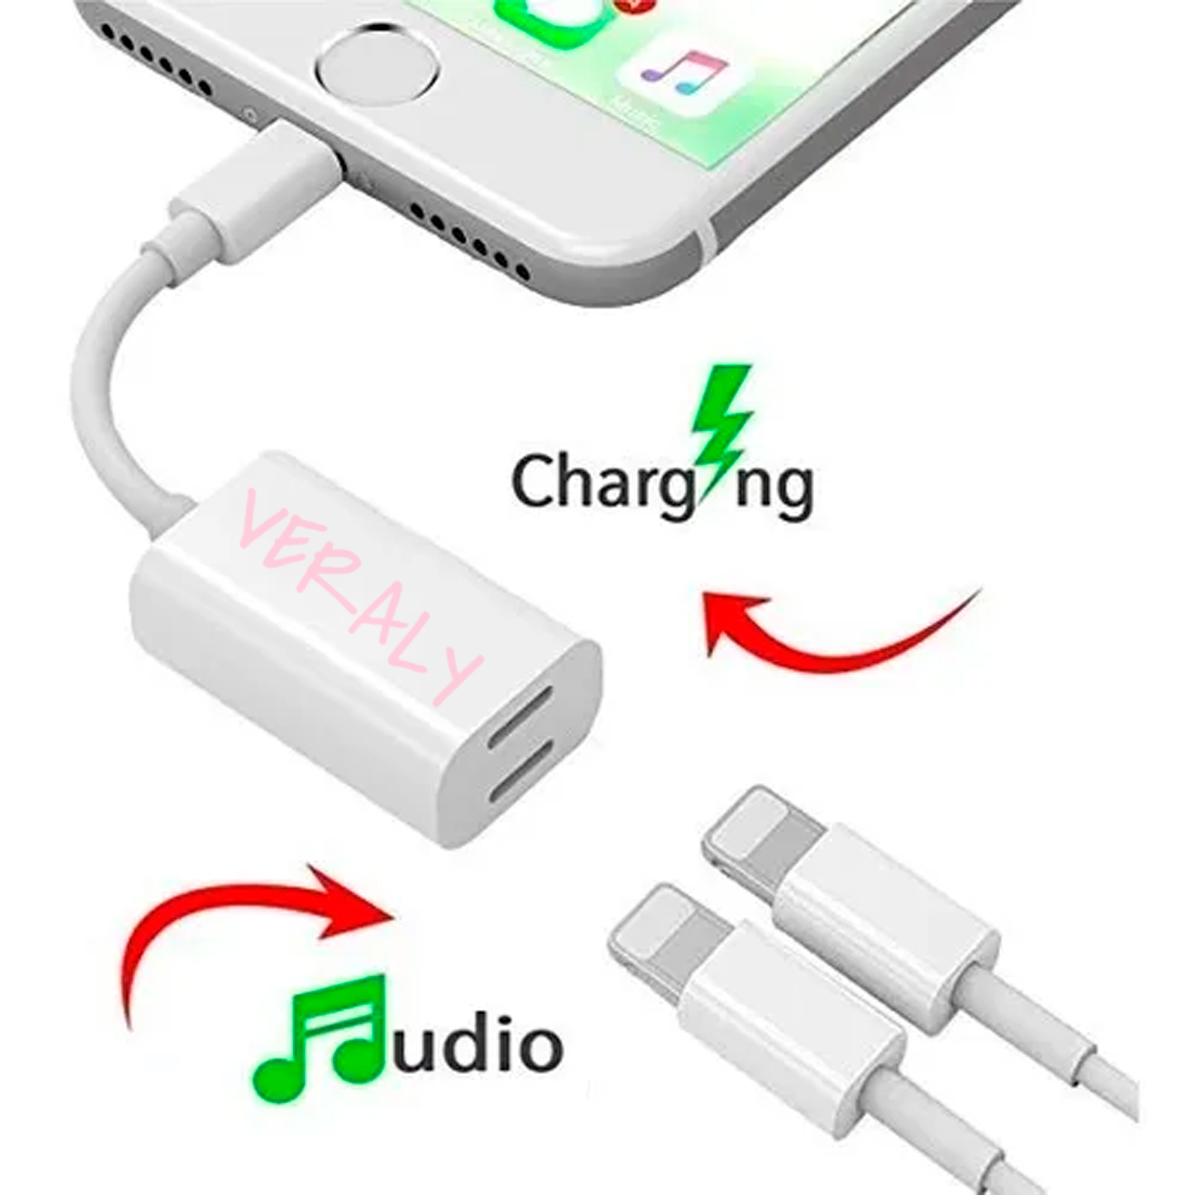 Adaptador Doble Lightning Audio-Carga Con Salida Lightning